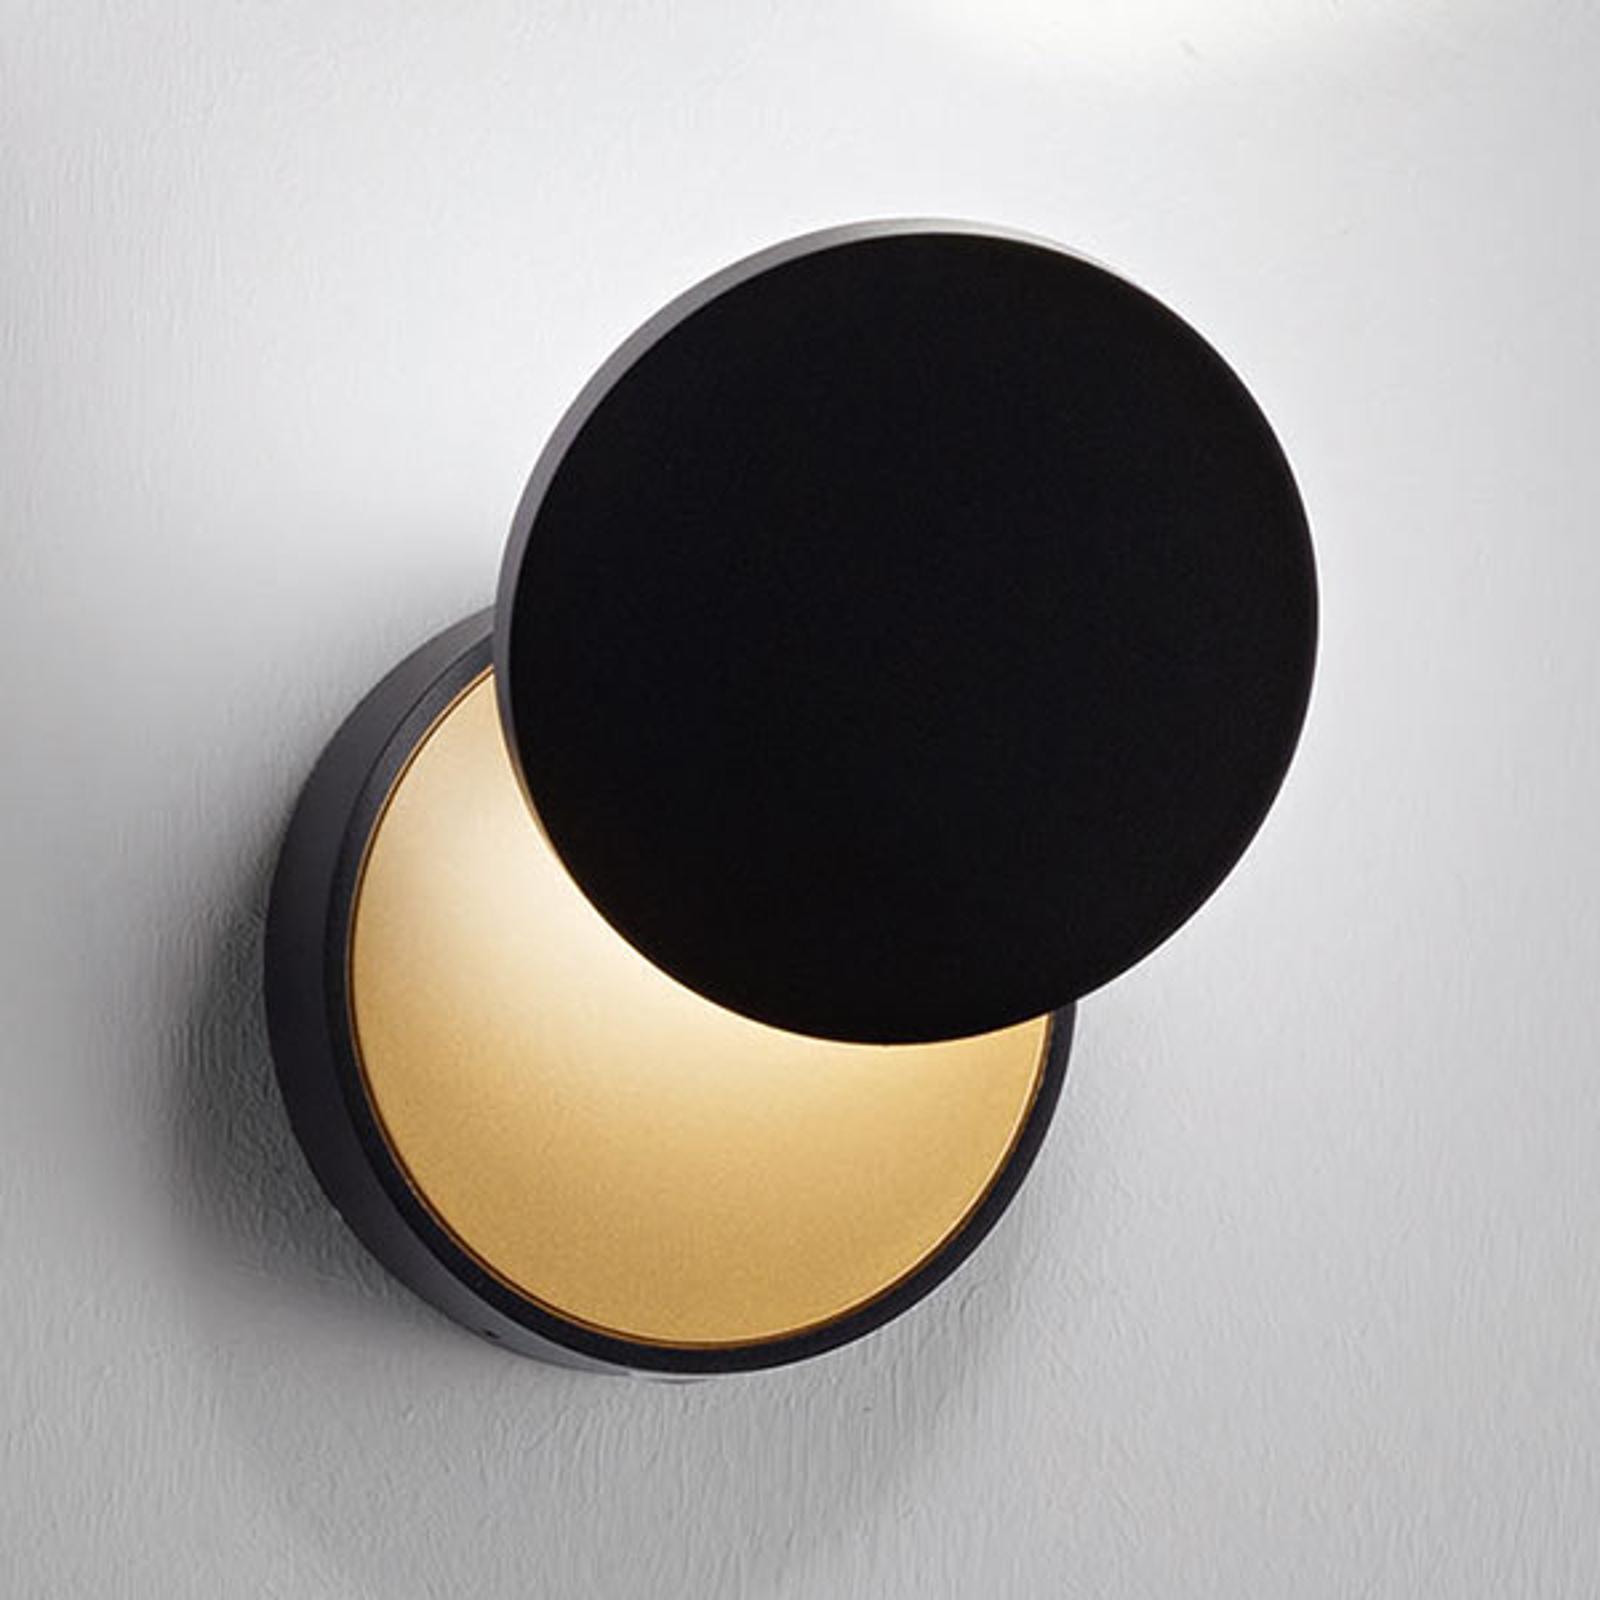 LED wandlamp Ara met leesspot, zwart-goud